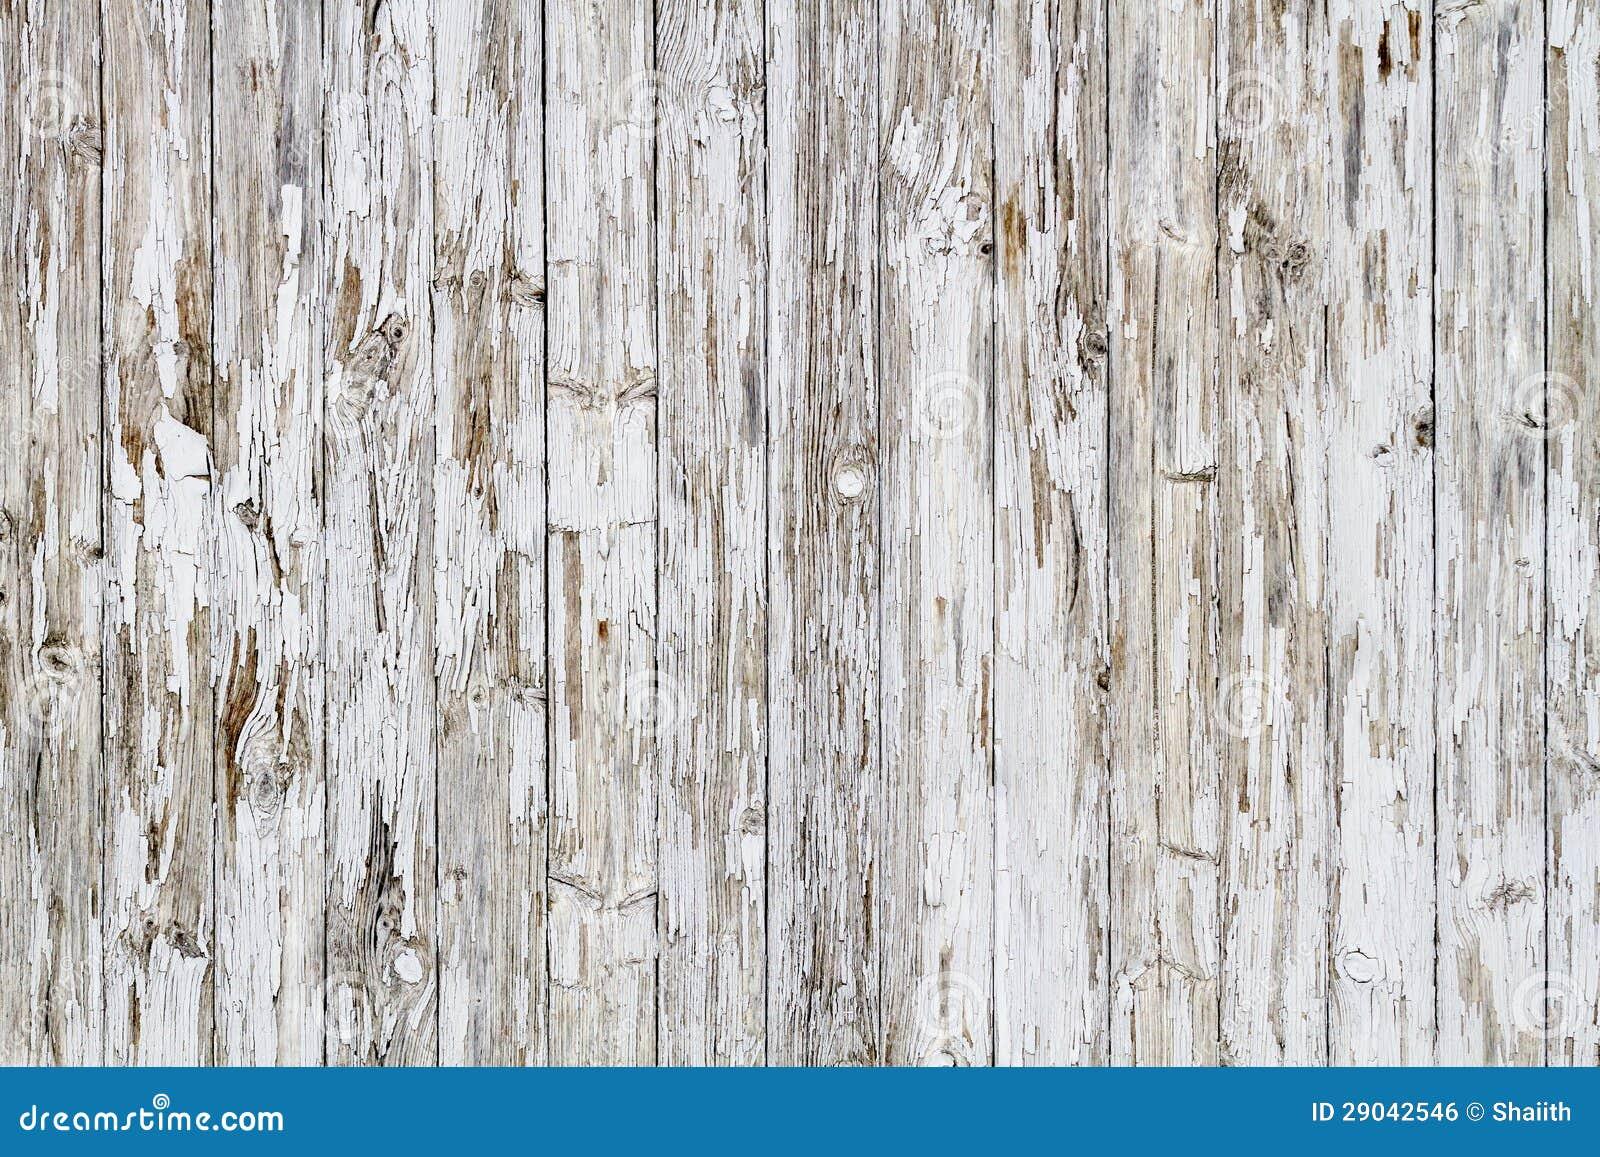 Old White Weathered Wooden Fence Stock Photo Image 29042546